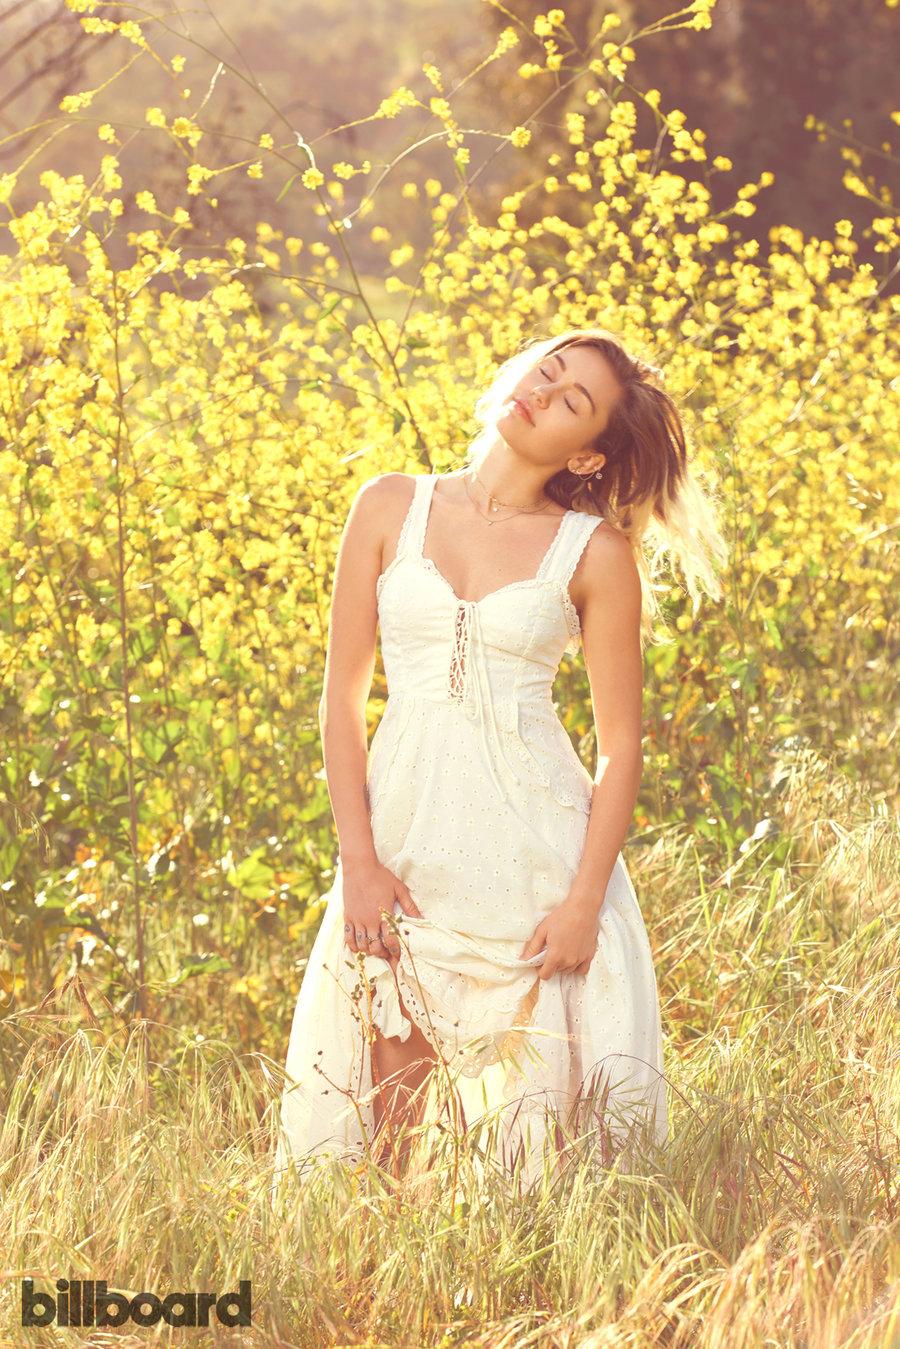 MileyCyrus-Billboard3